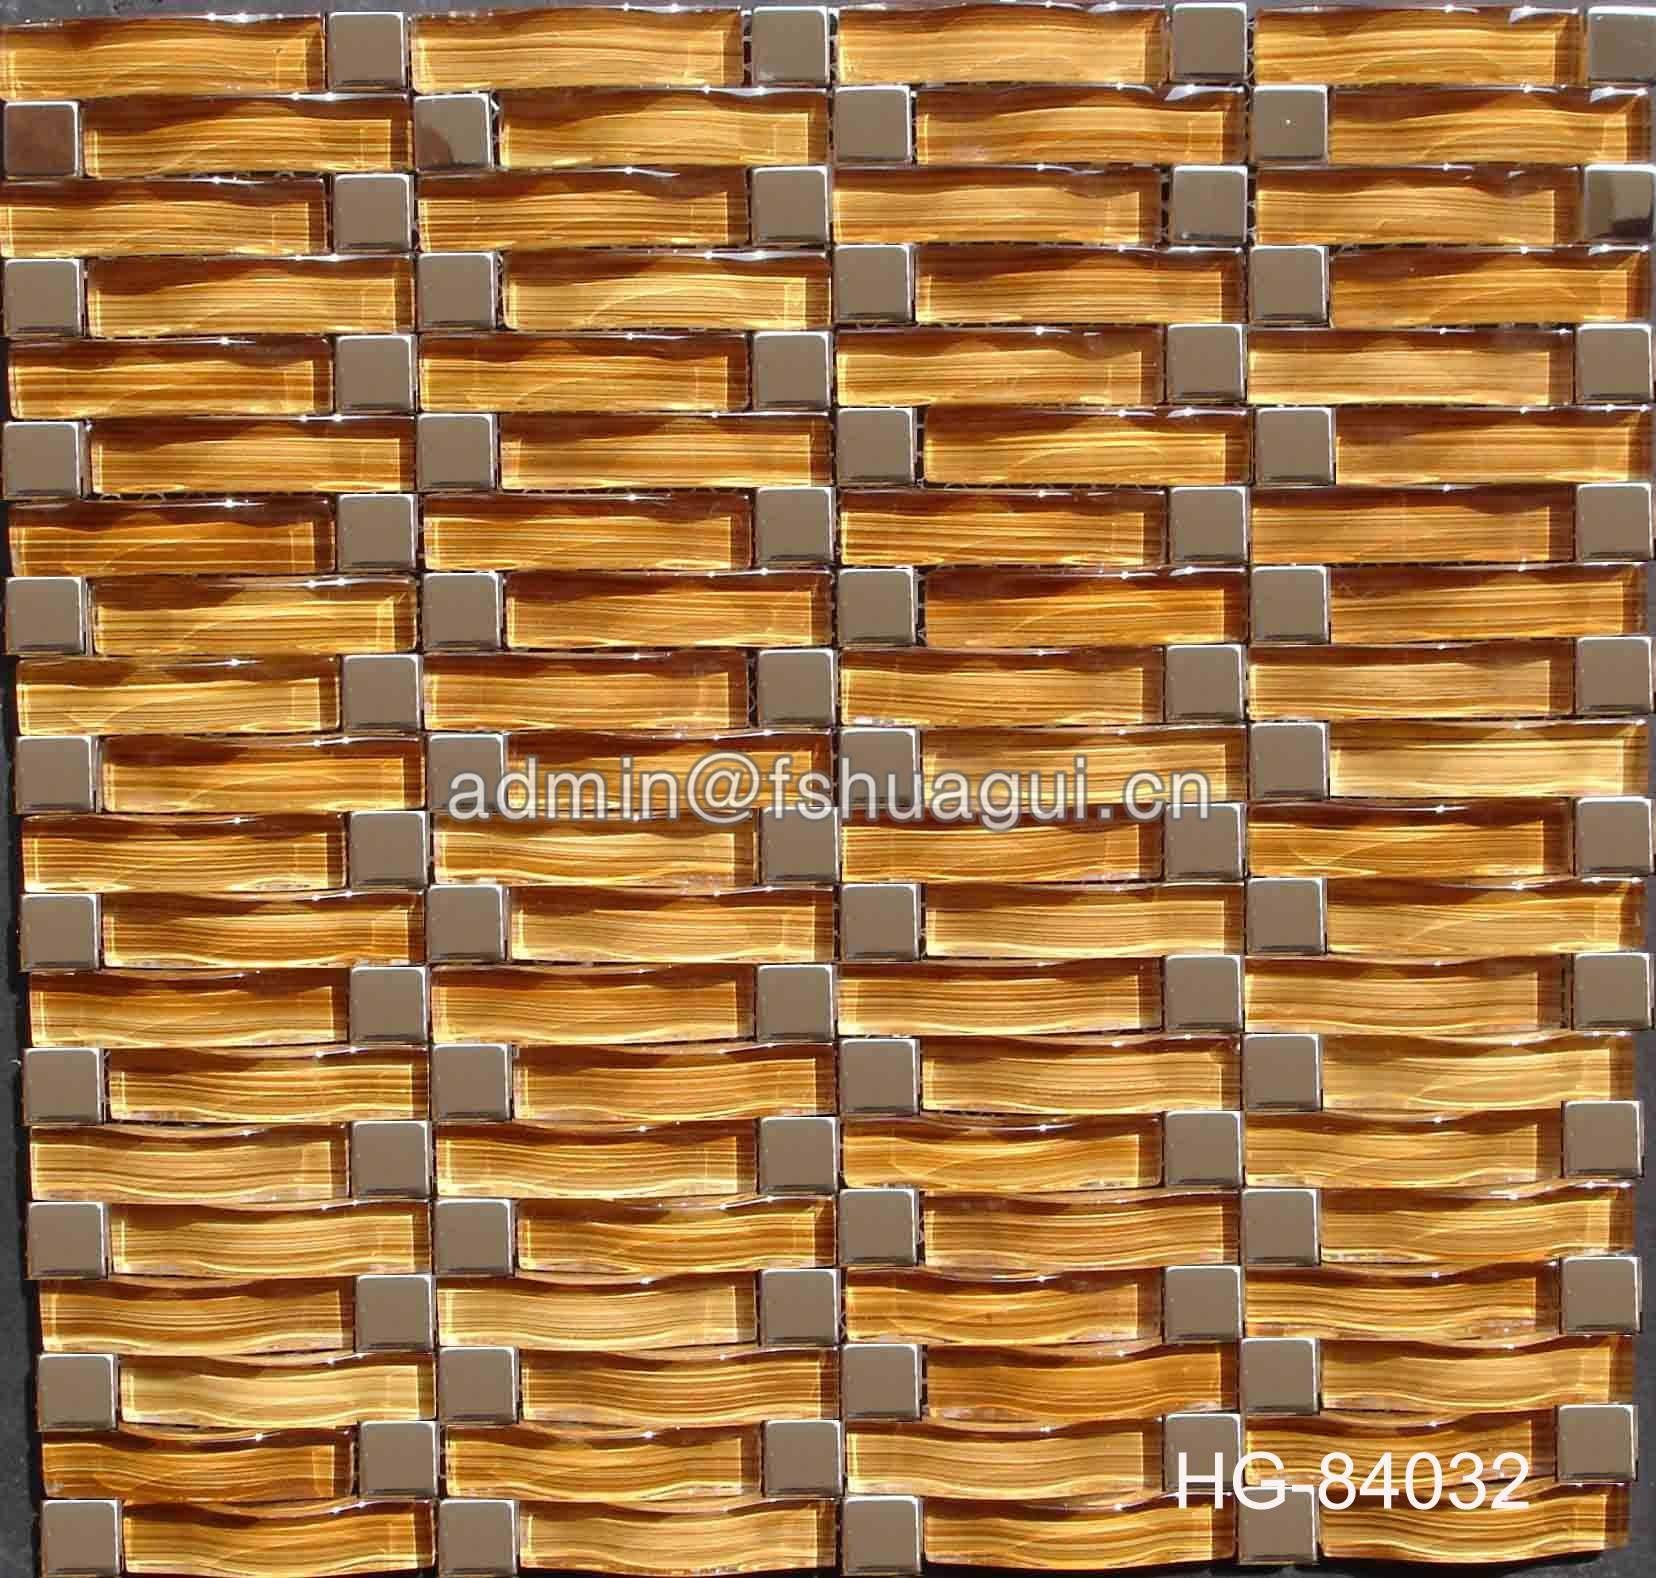 Huagui Luxury  Interior Backsplash Stainless Steel Mixed Glass Mosaic Tile HG-84032 GLASS MOSAIC TILE image36